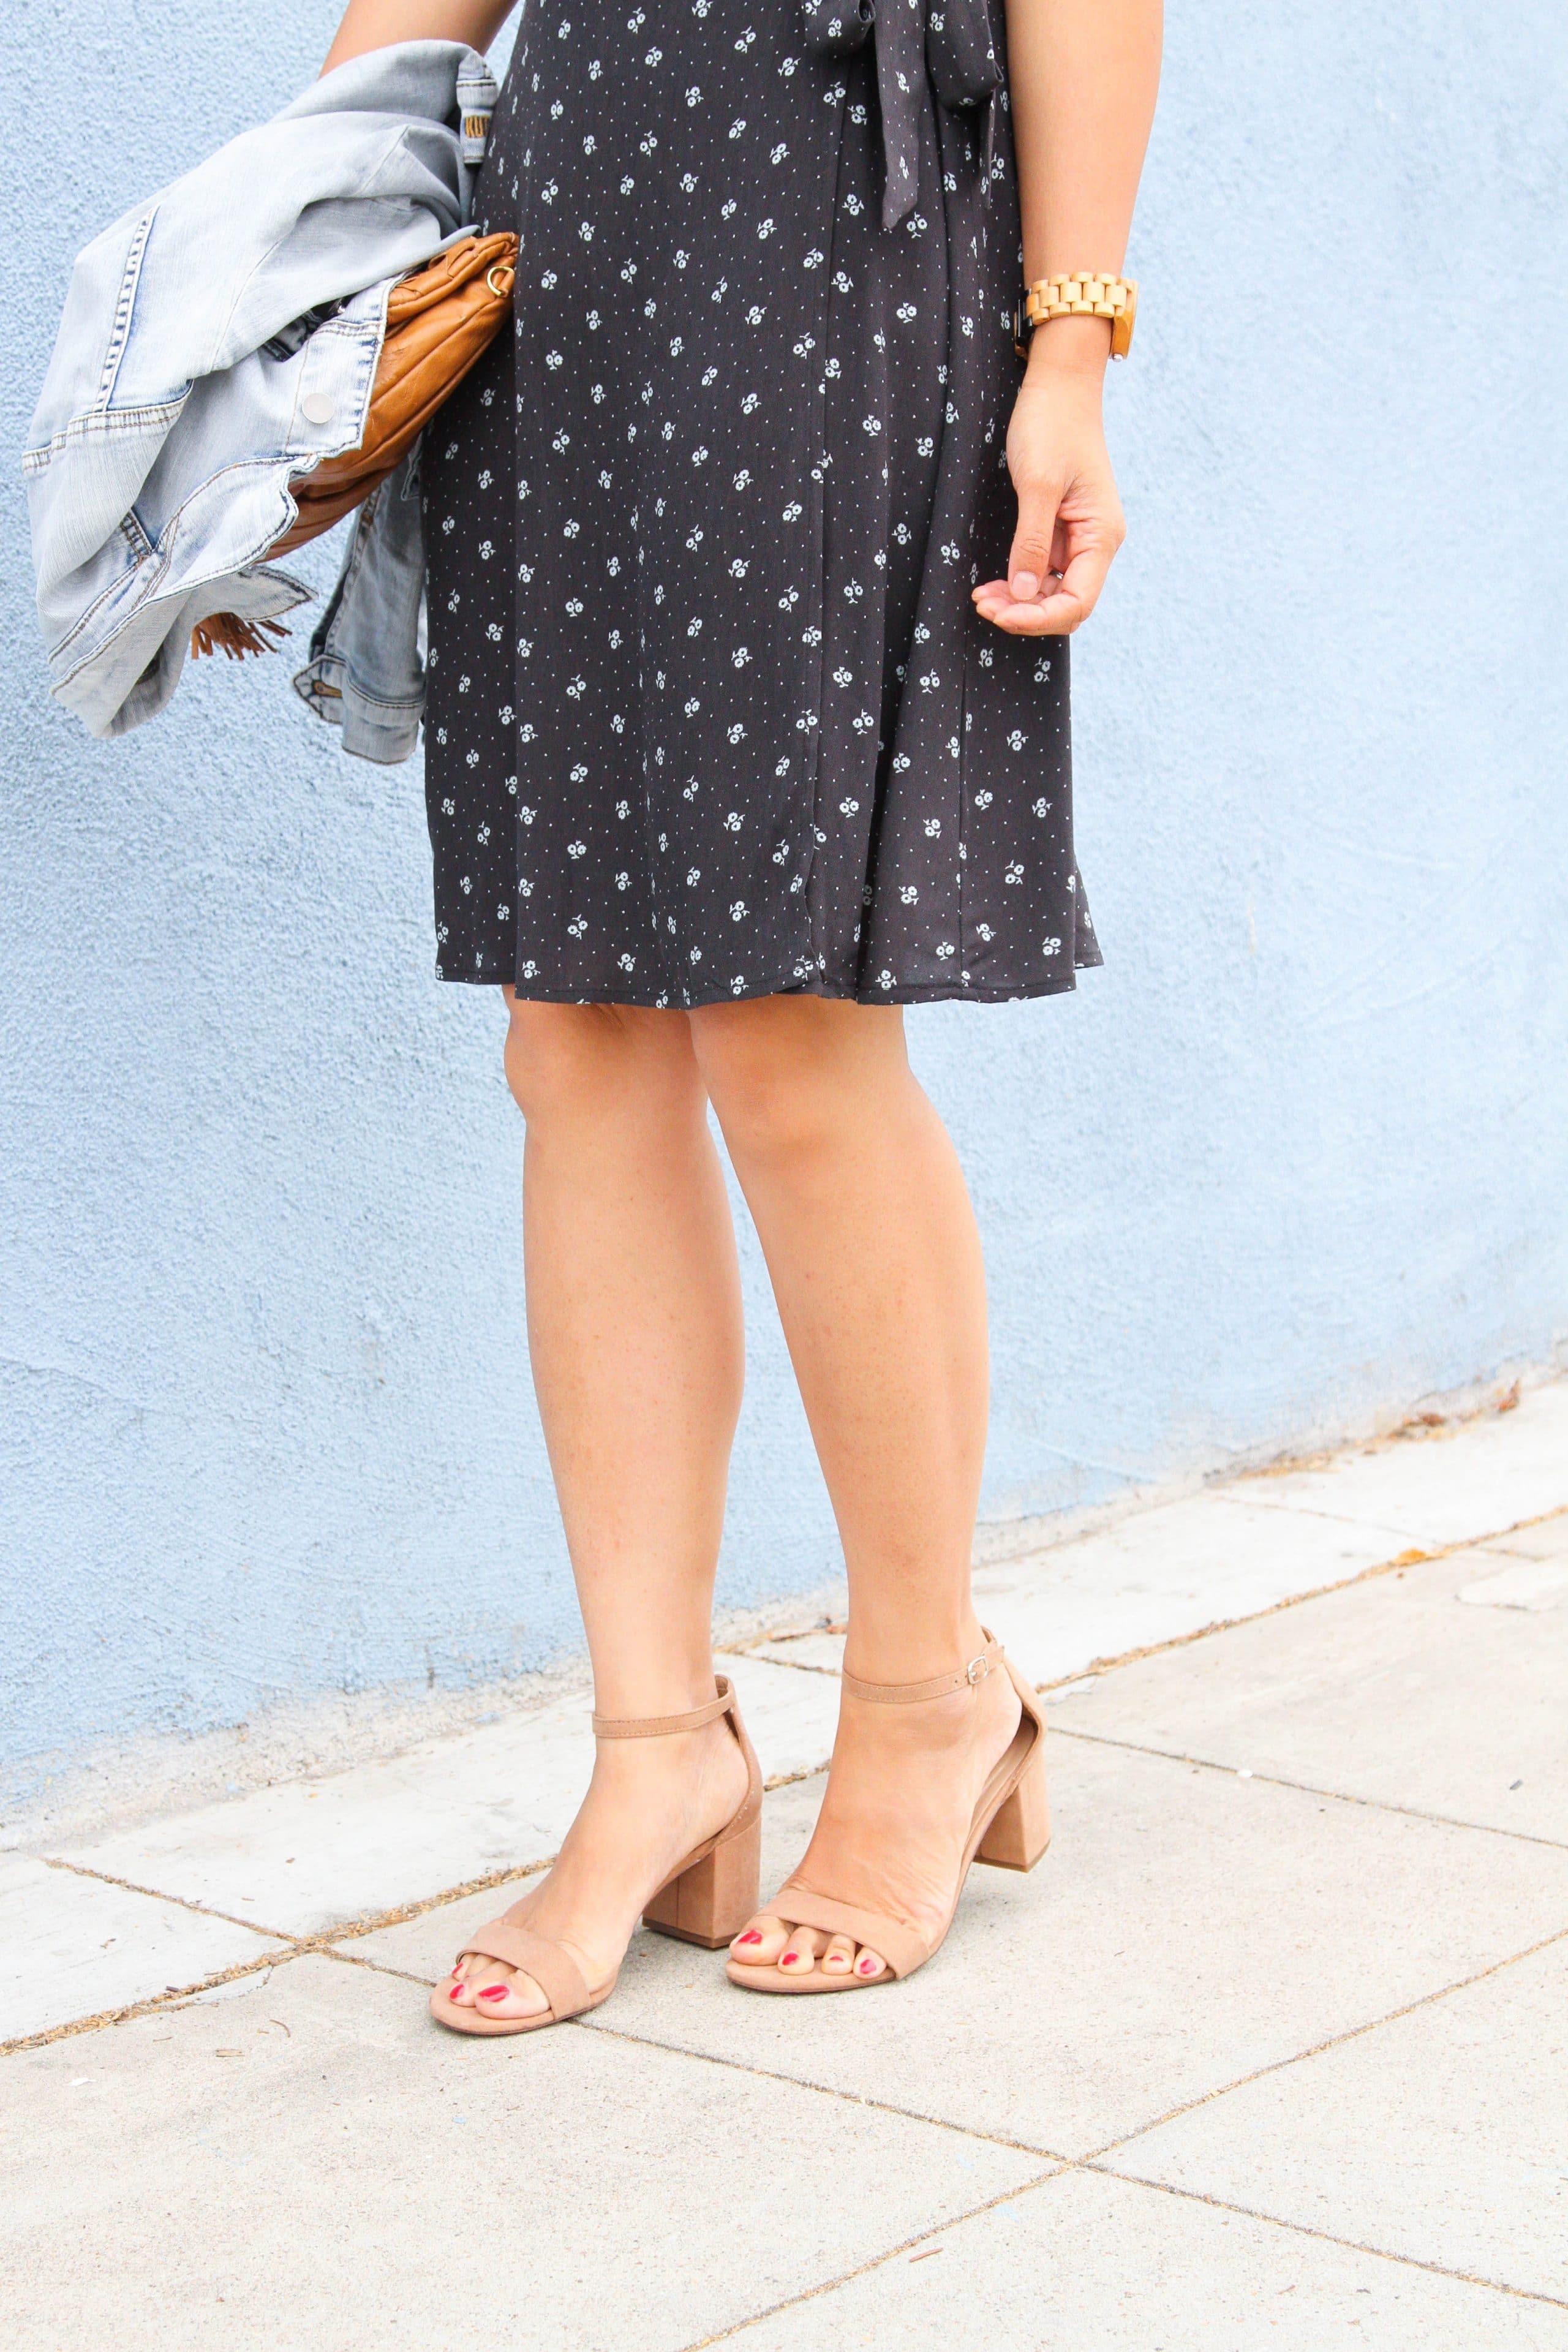 black floral wrap dress + taupe block heel sandals + denim jacket + cognac clutch